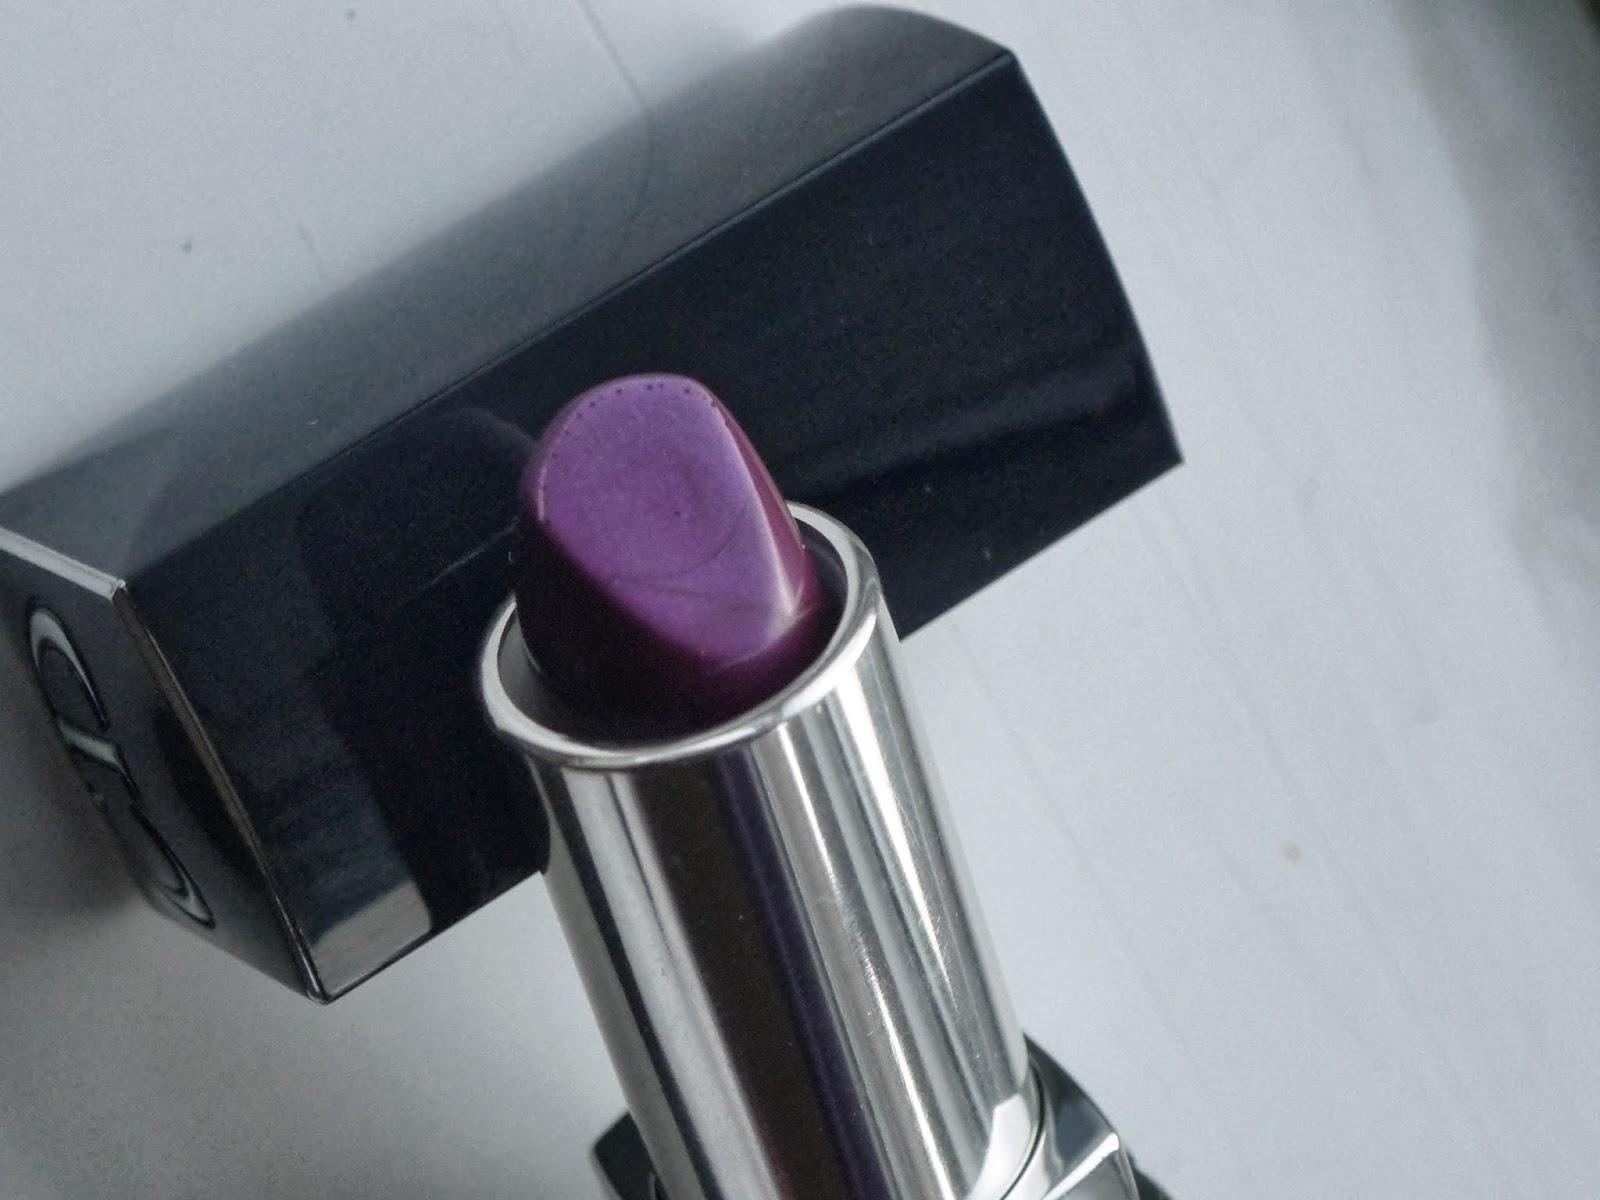 Rouge Dior Mauve Mystere Lipstick